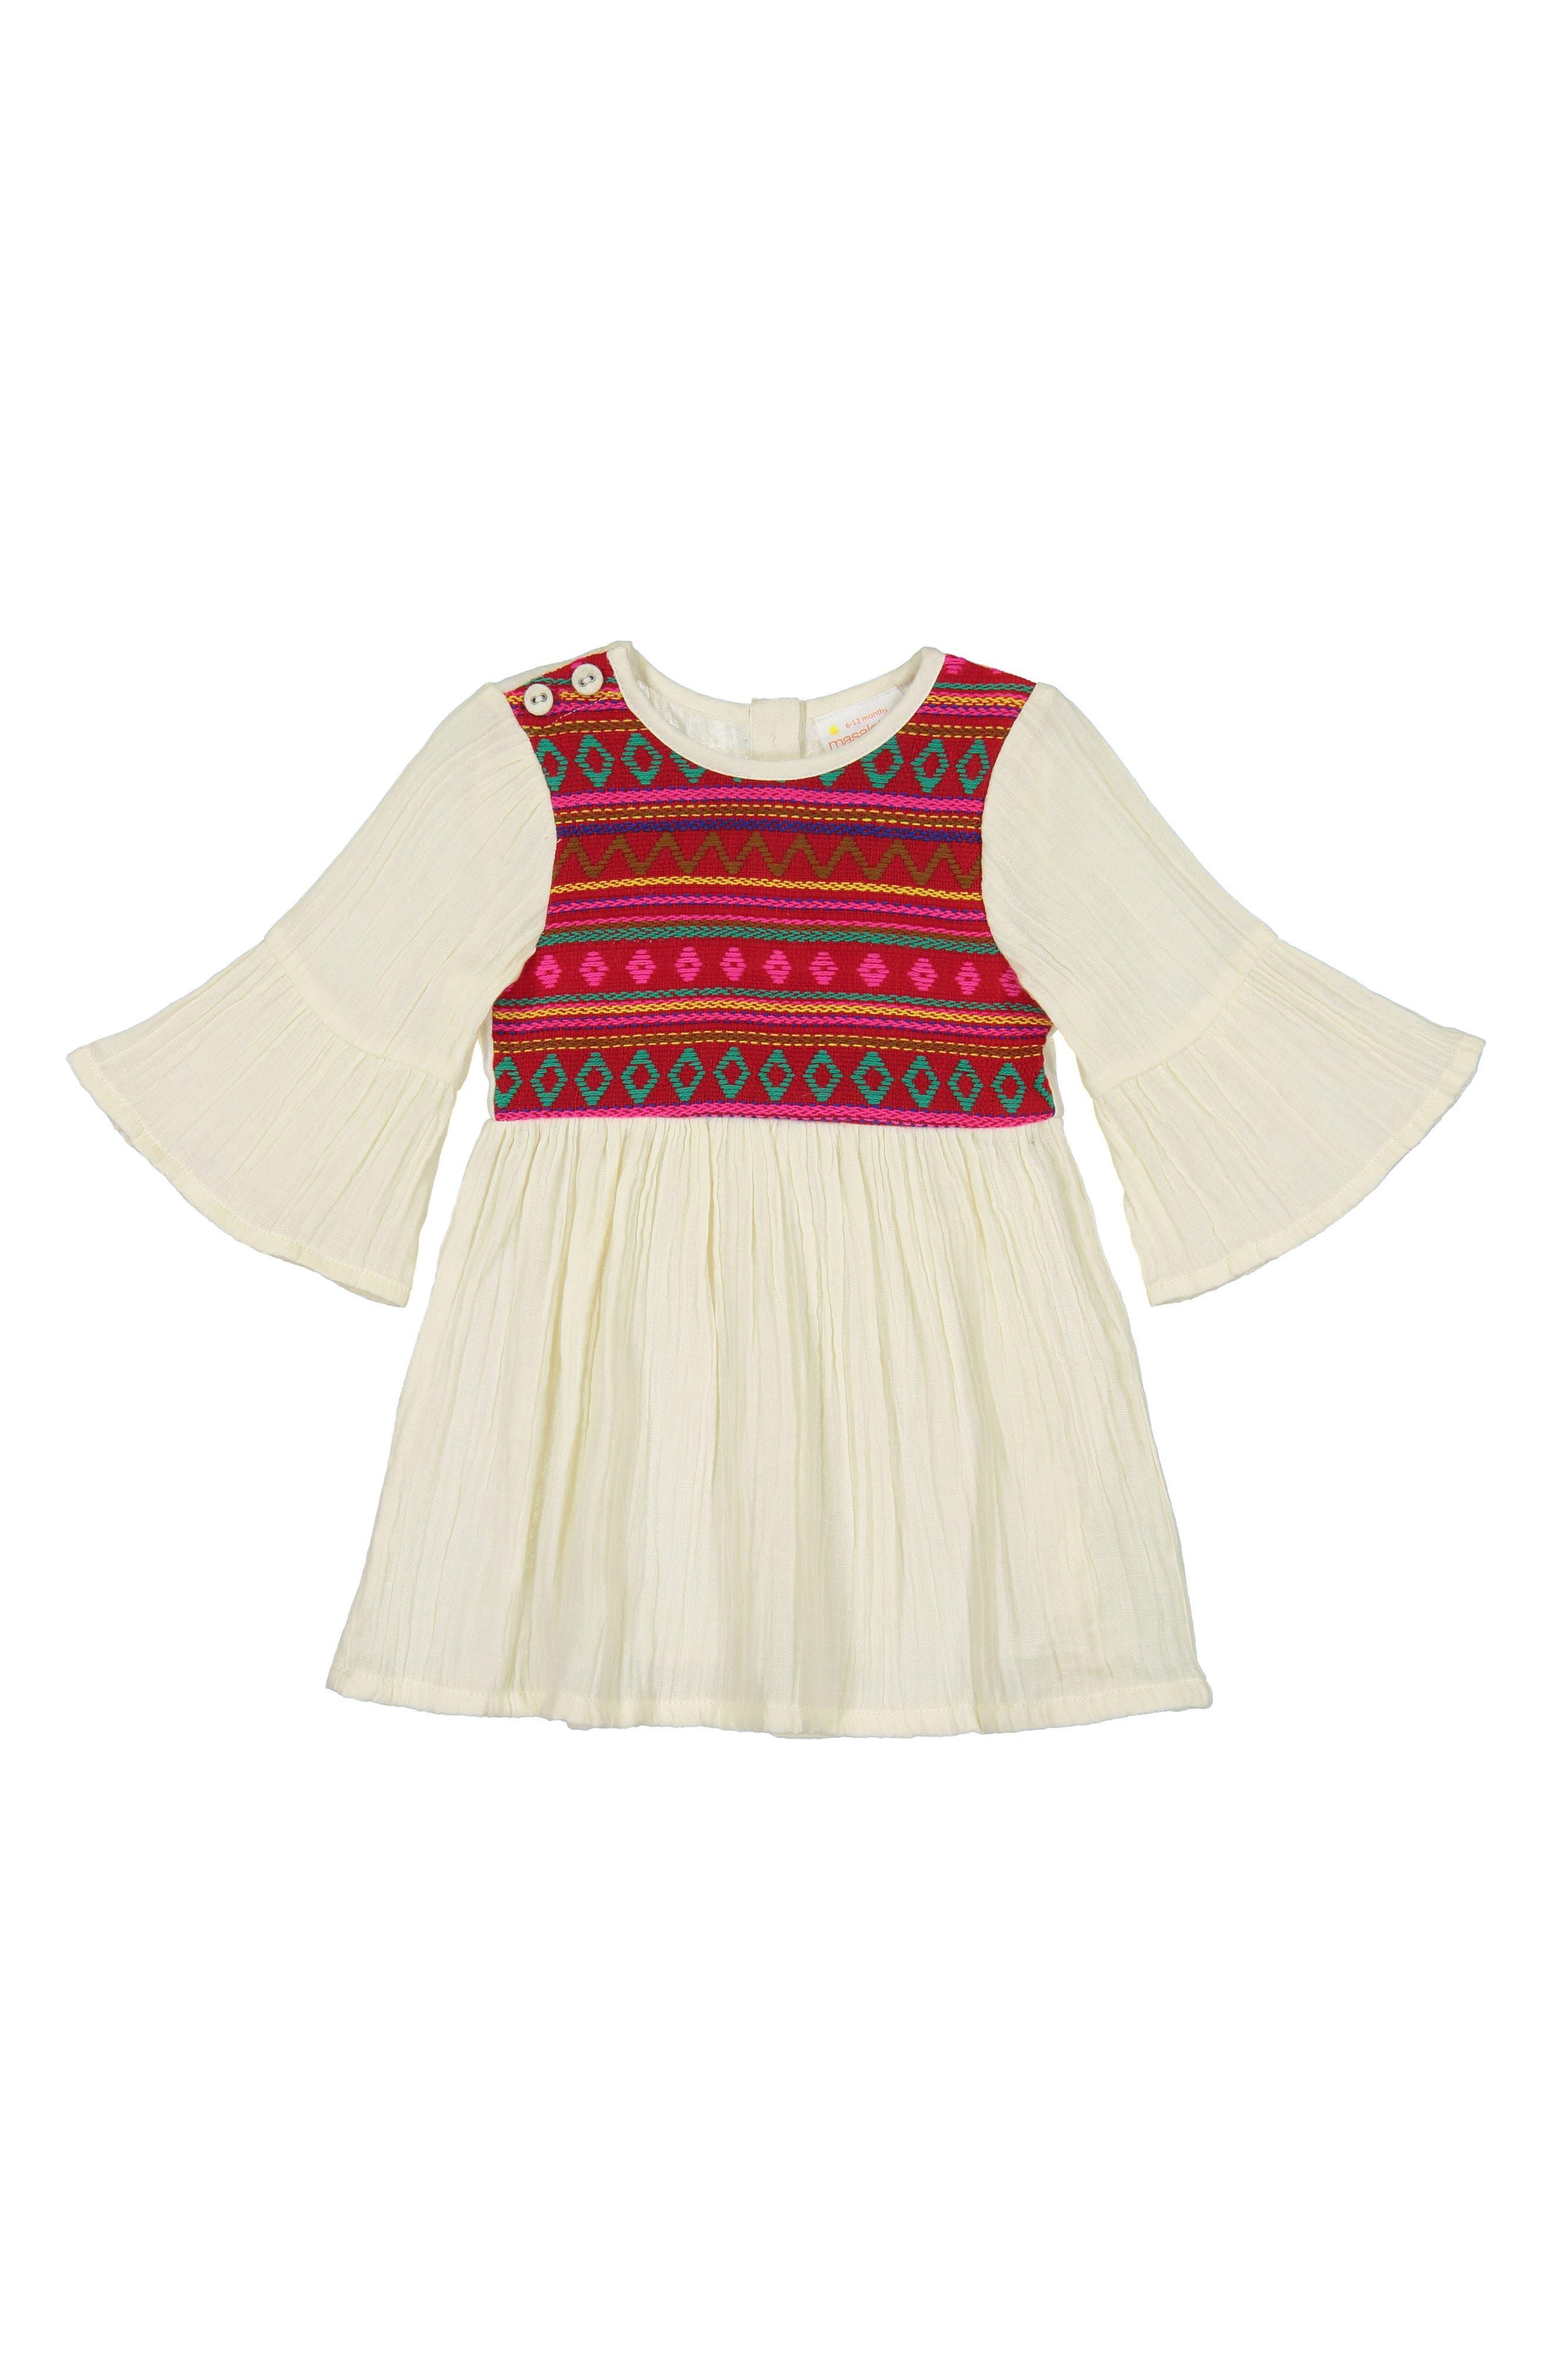 Simple Jacquard Dress, Main, color, 600